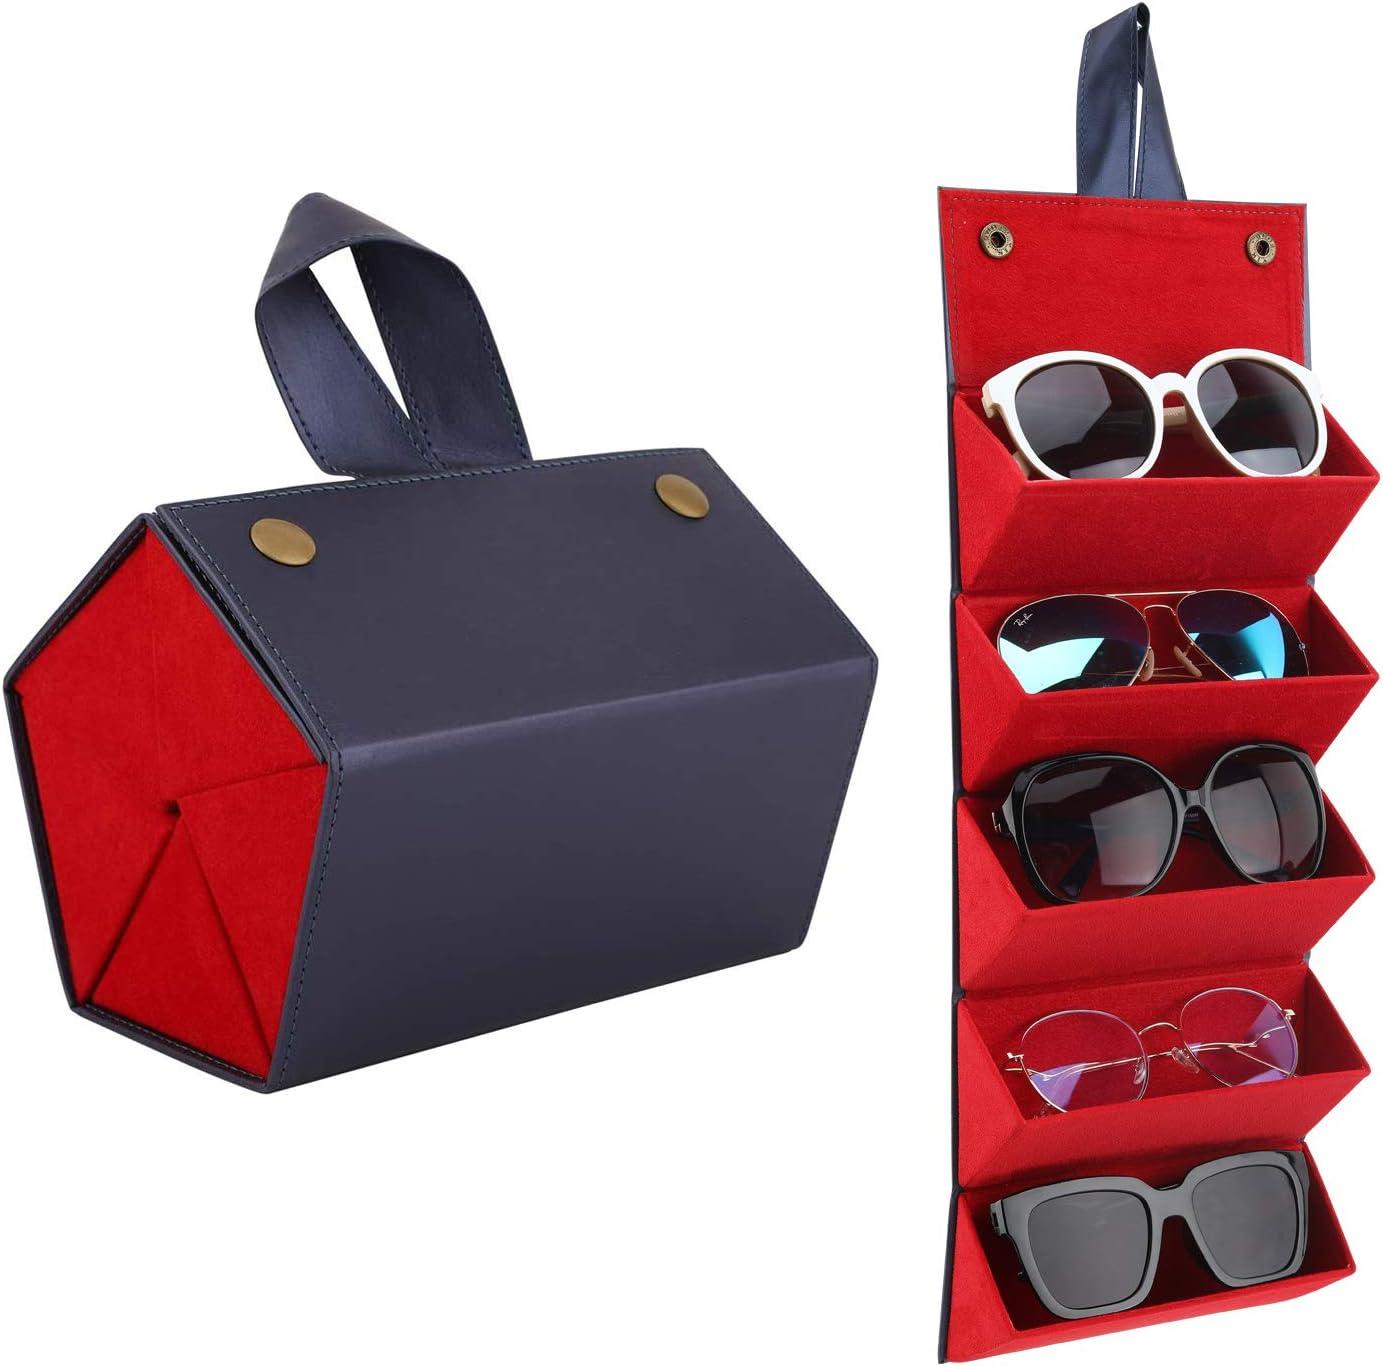 MoKo Estuche de Gafa para almacenar 5 anteojos, Gafas de Sol Presentación Gafas Pantalla, Organizador Portátil Caja de Cuero para Gafas Estuche para Guardar para Hombre y Mujer